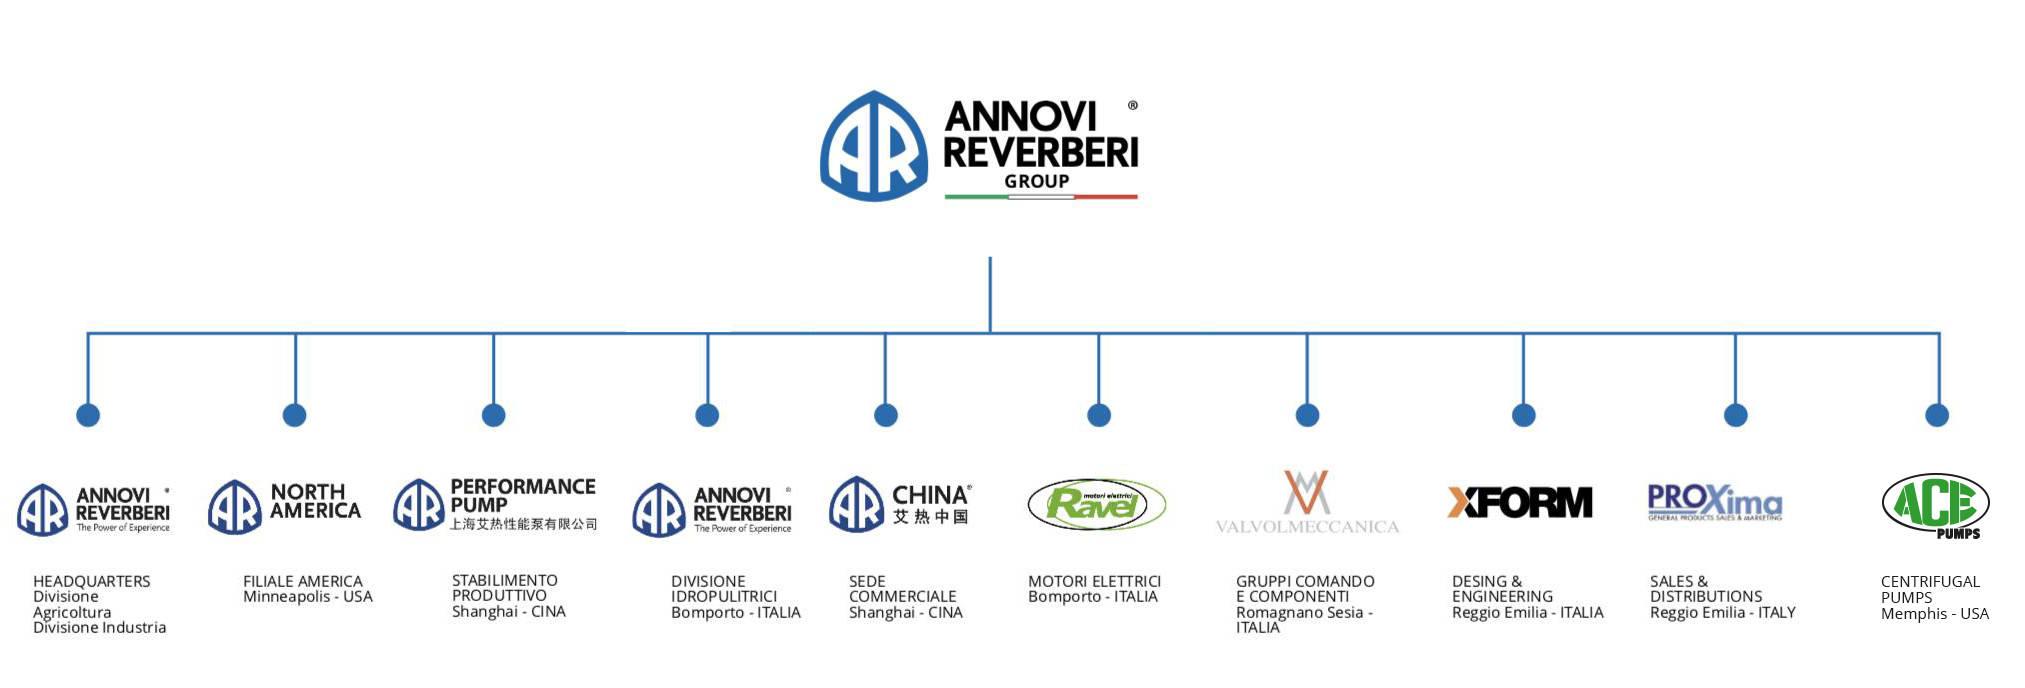 The Annovi Reverberi Group